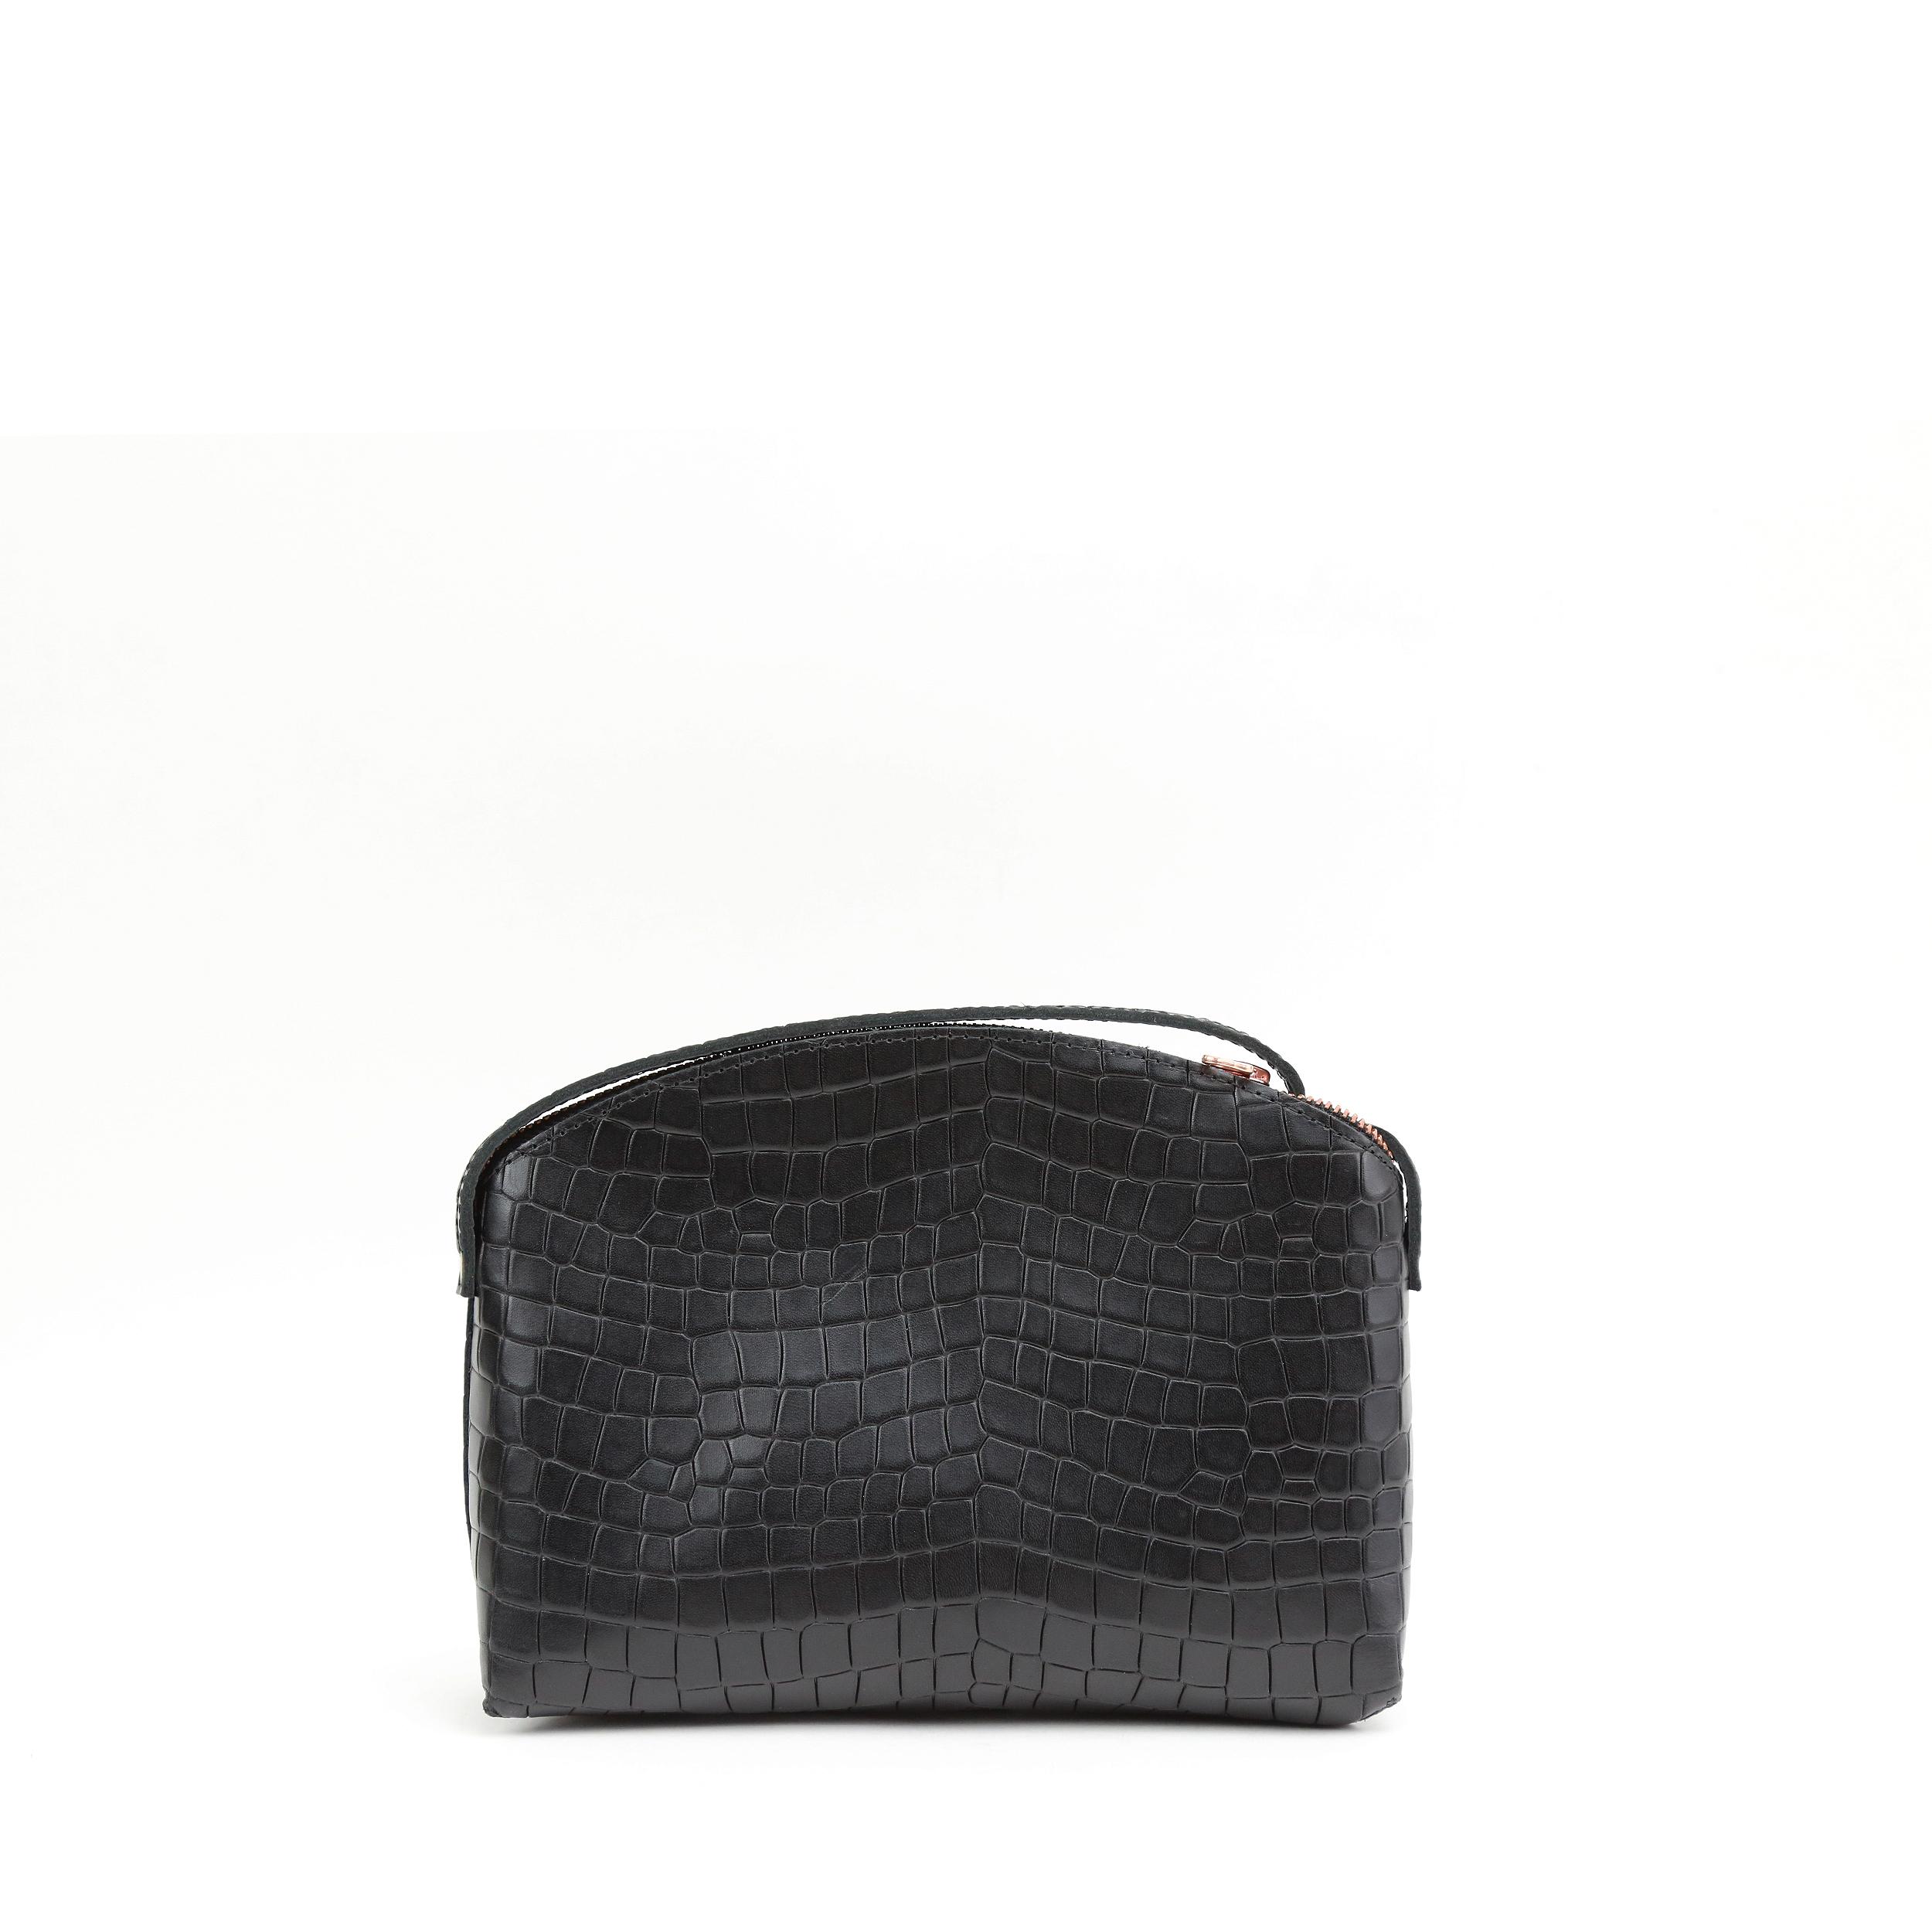 TIMI-Crossbody-Bag-Croco-Black-2